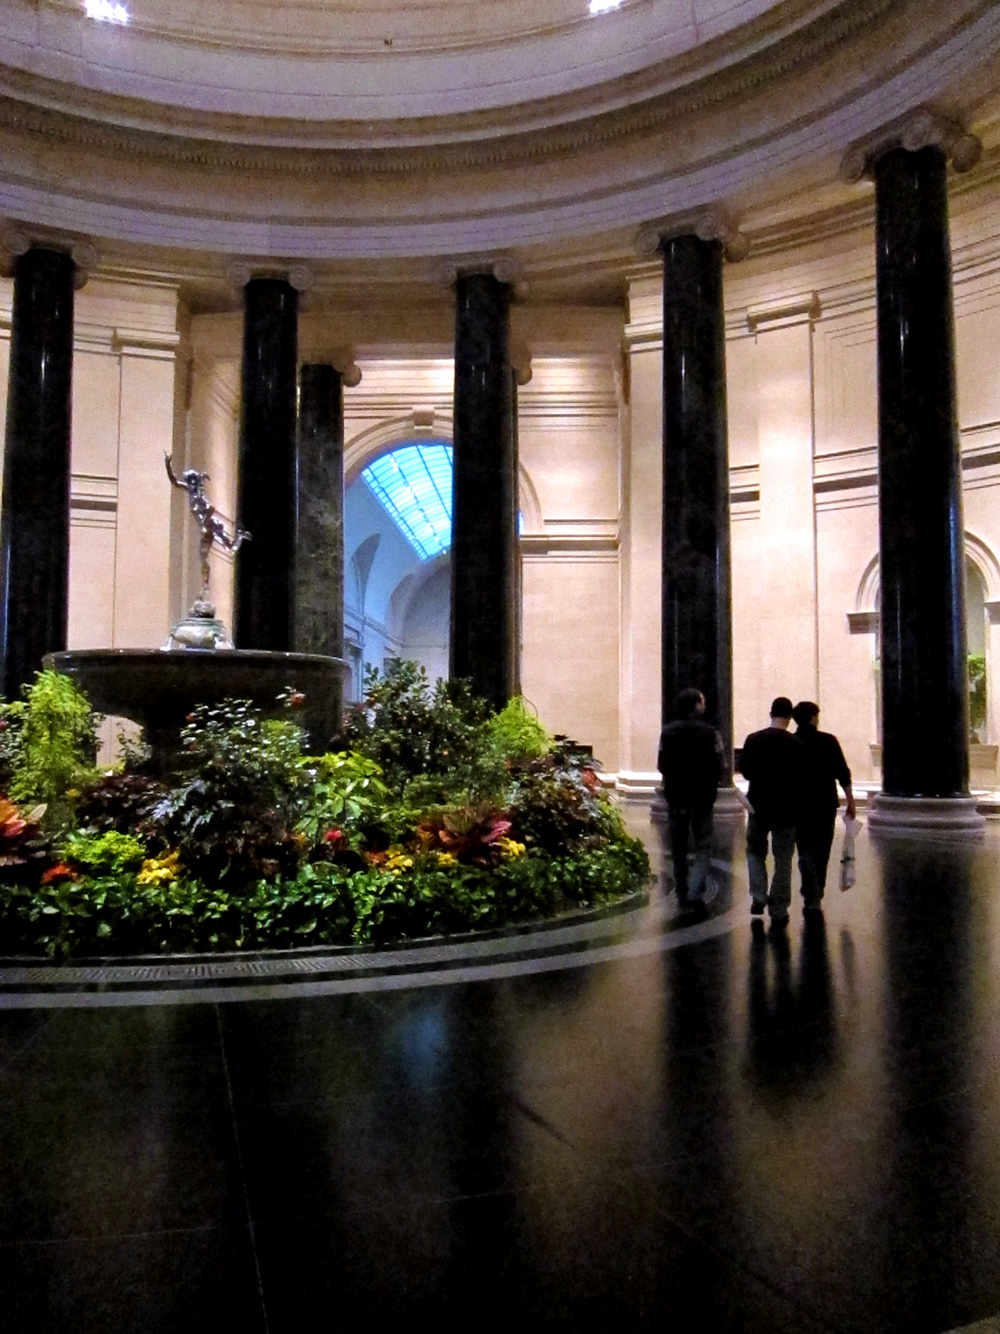 National Gallery of Art rotunda (Washington DC), © 2014 Susan Barsy